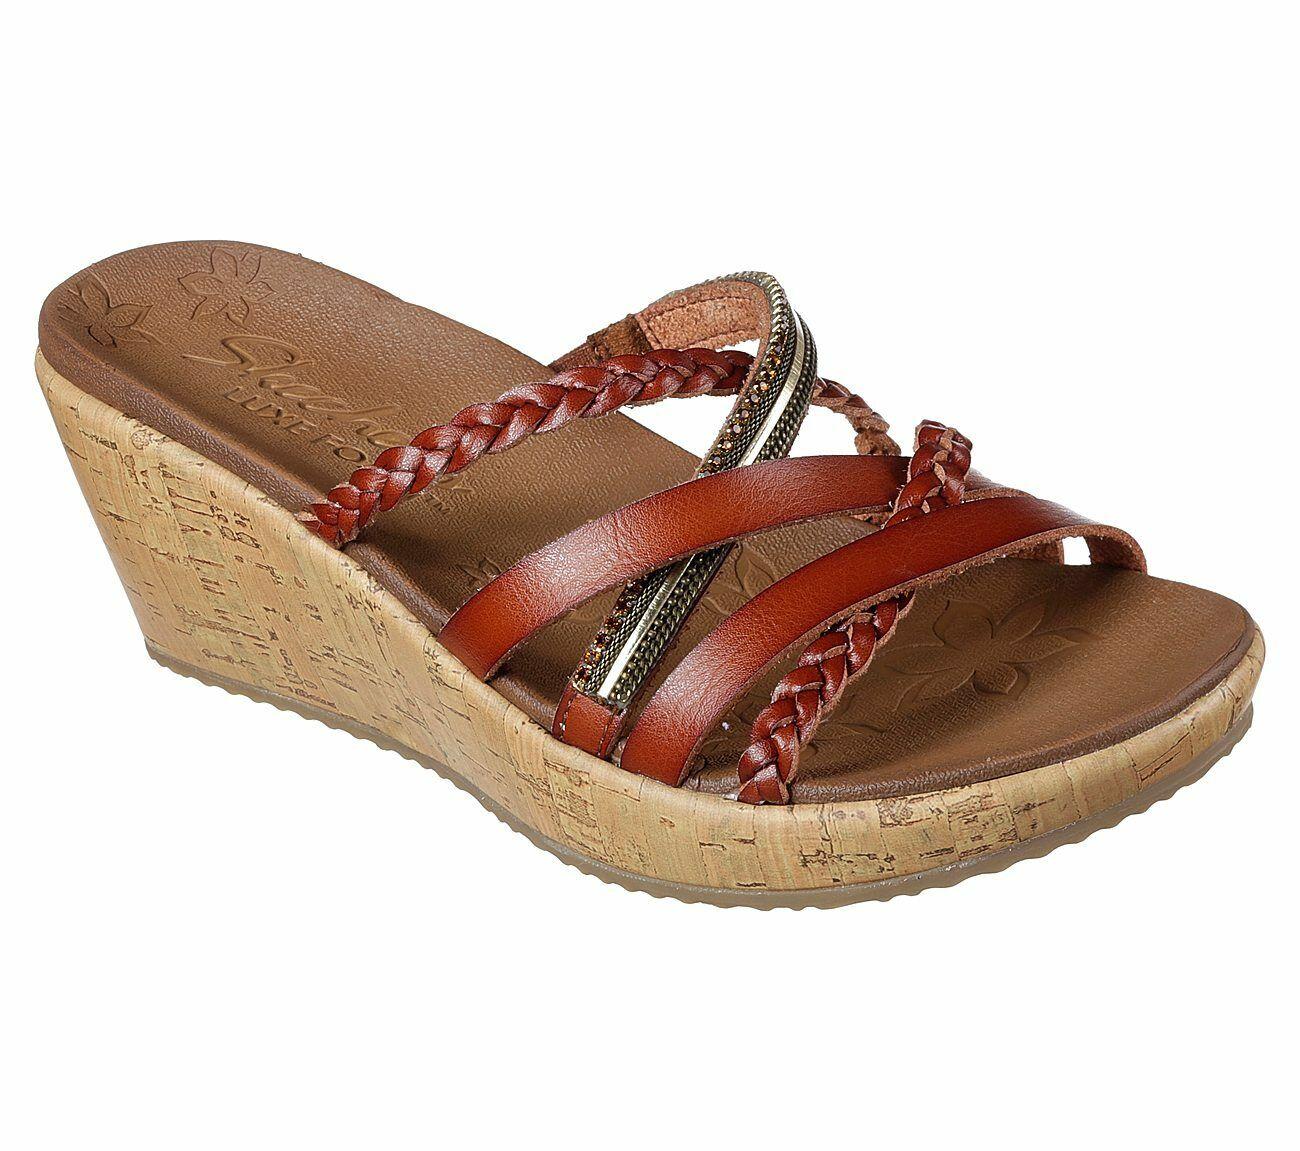 Skechers Beverlee - Sozial Labor Sandalen Damen Keil Riemen Sommer Schuhe 31716